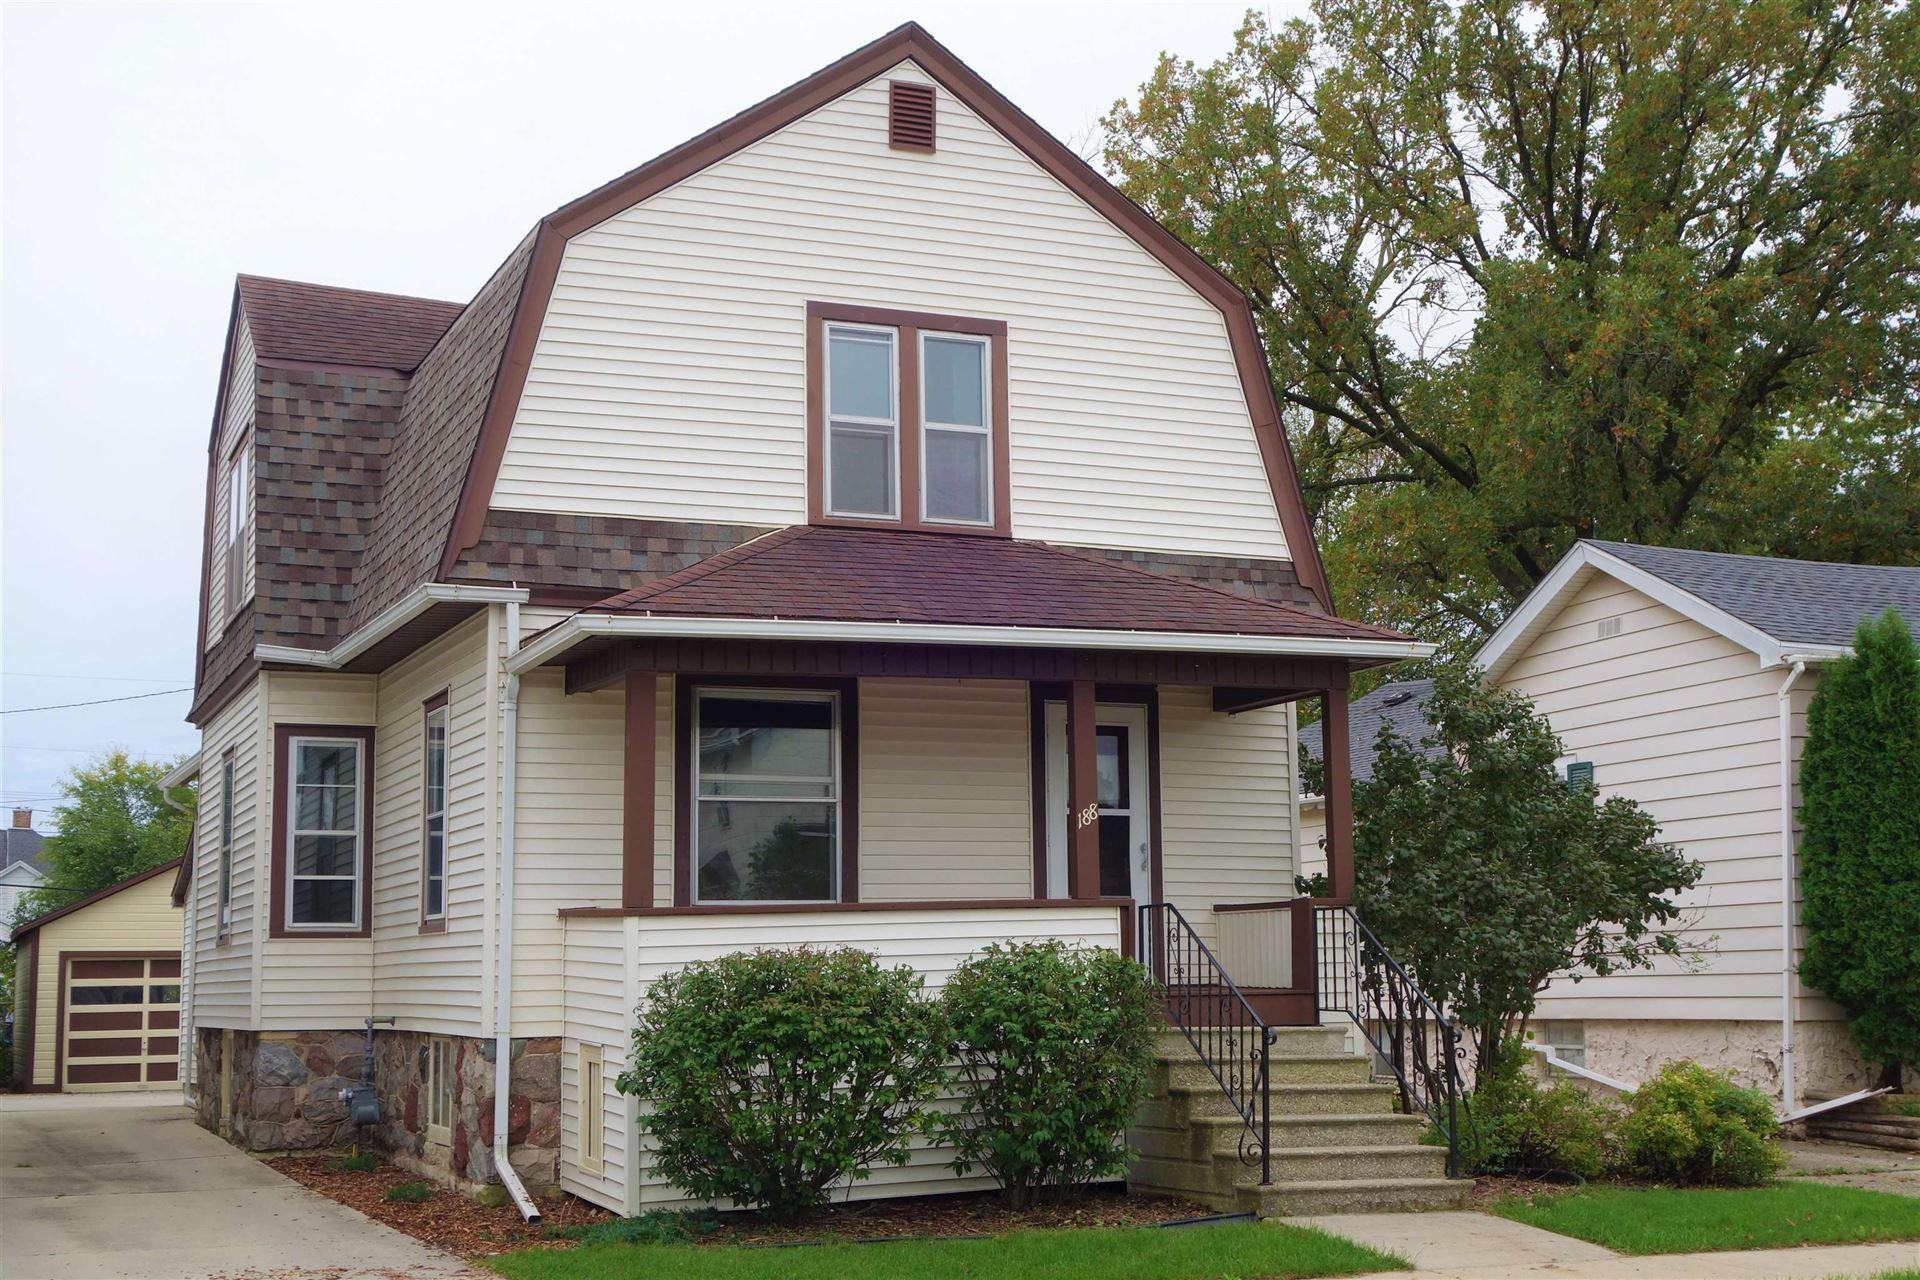 188 E REES Street, Fond du Lac, WI 54935 - MLS#: 50249663